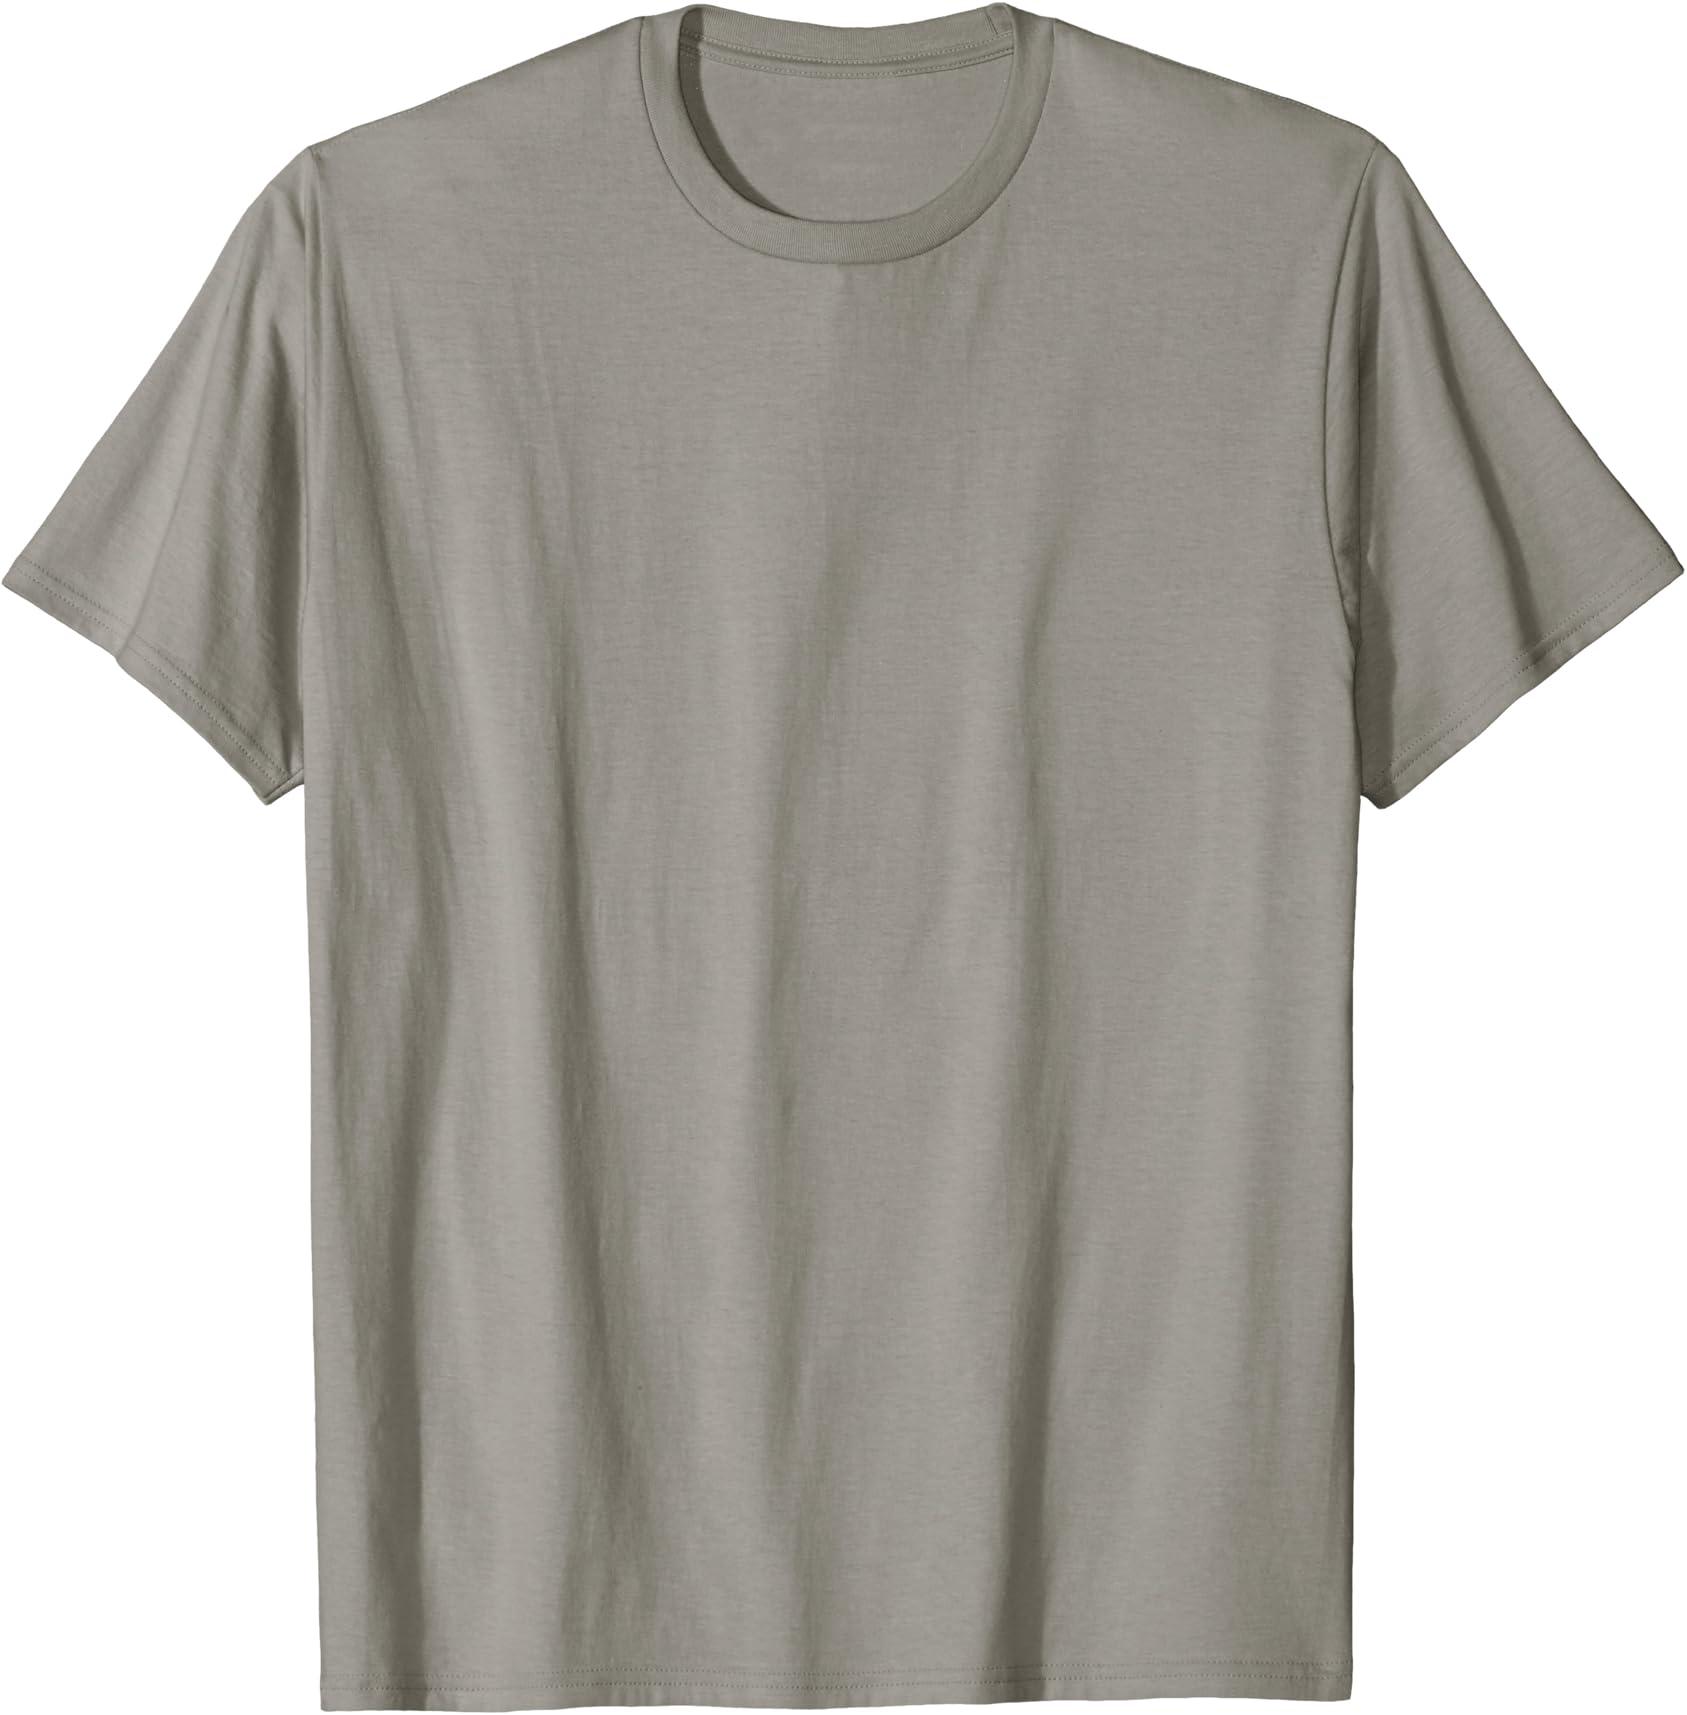 I Can/'t Keep Calm I/'m Going to Be a GRANDMA T-shirt tee New mummy baby dad gift